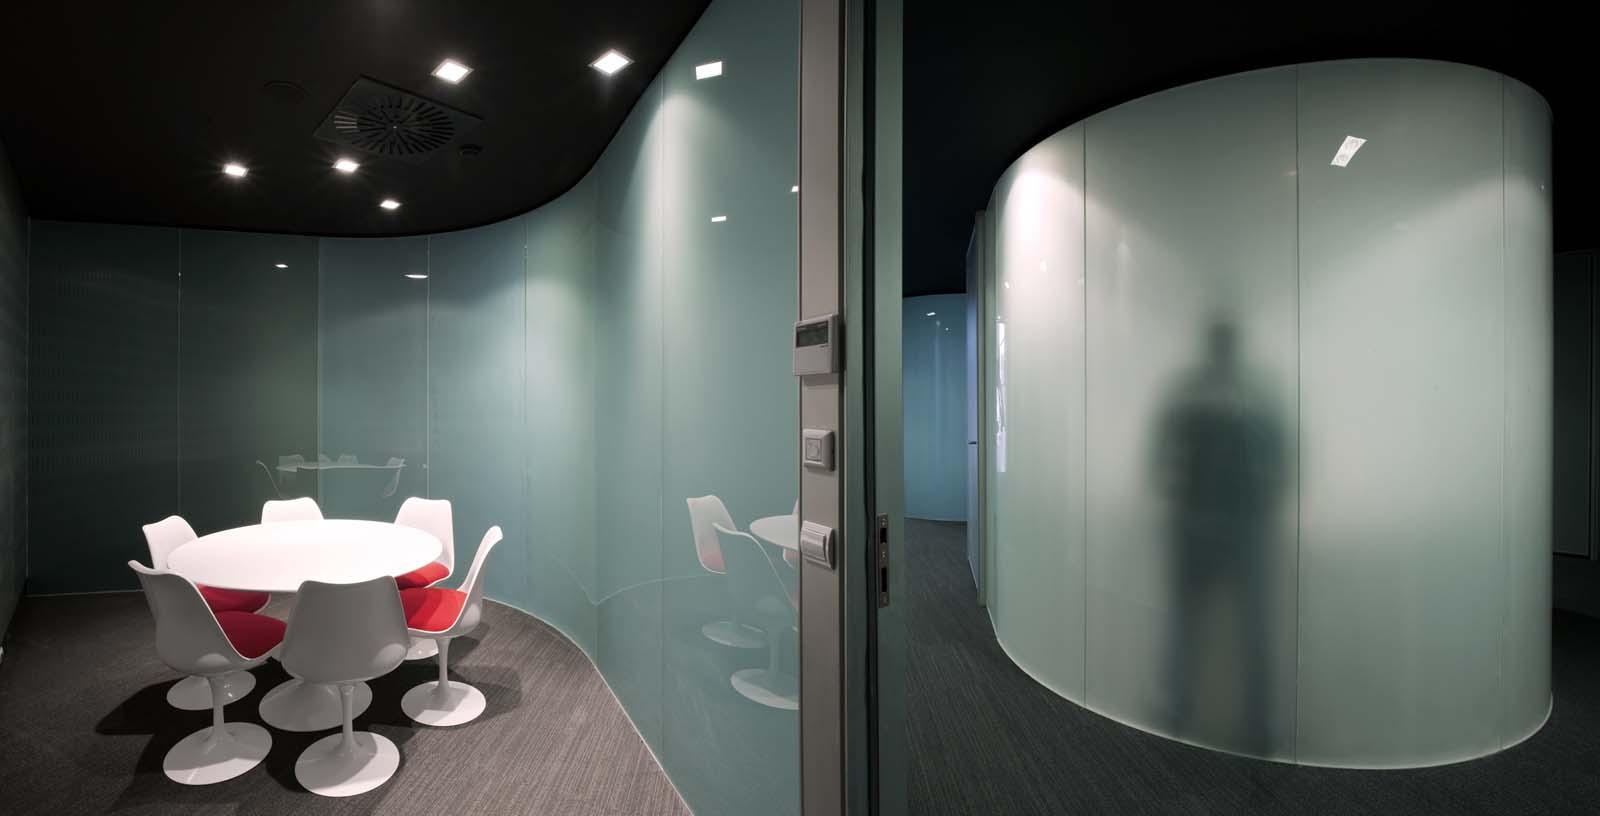 AIC_Automotive_Centre_05_Architecture_Idom_photos_Aitor_Ortiz